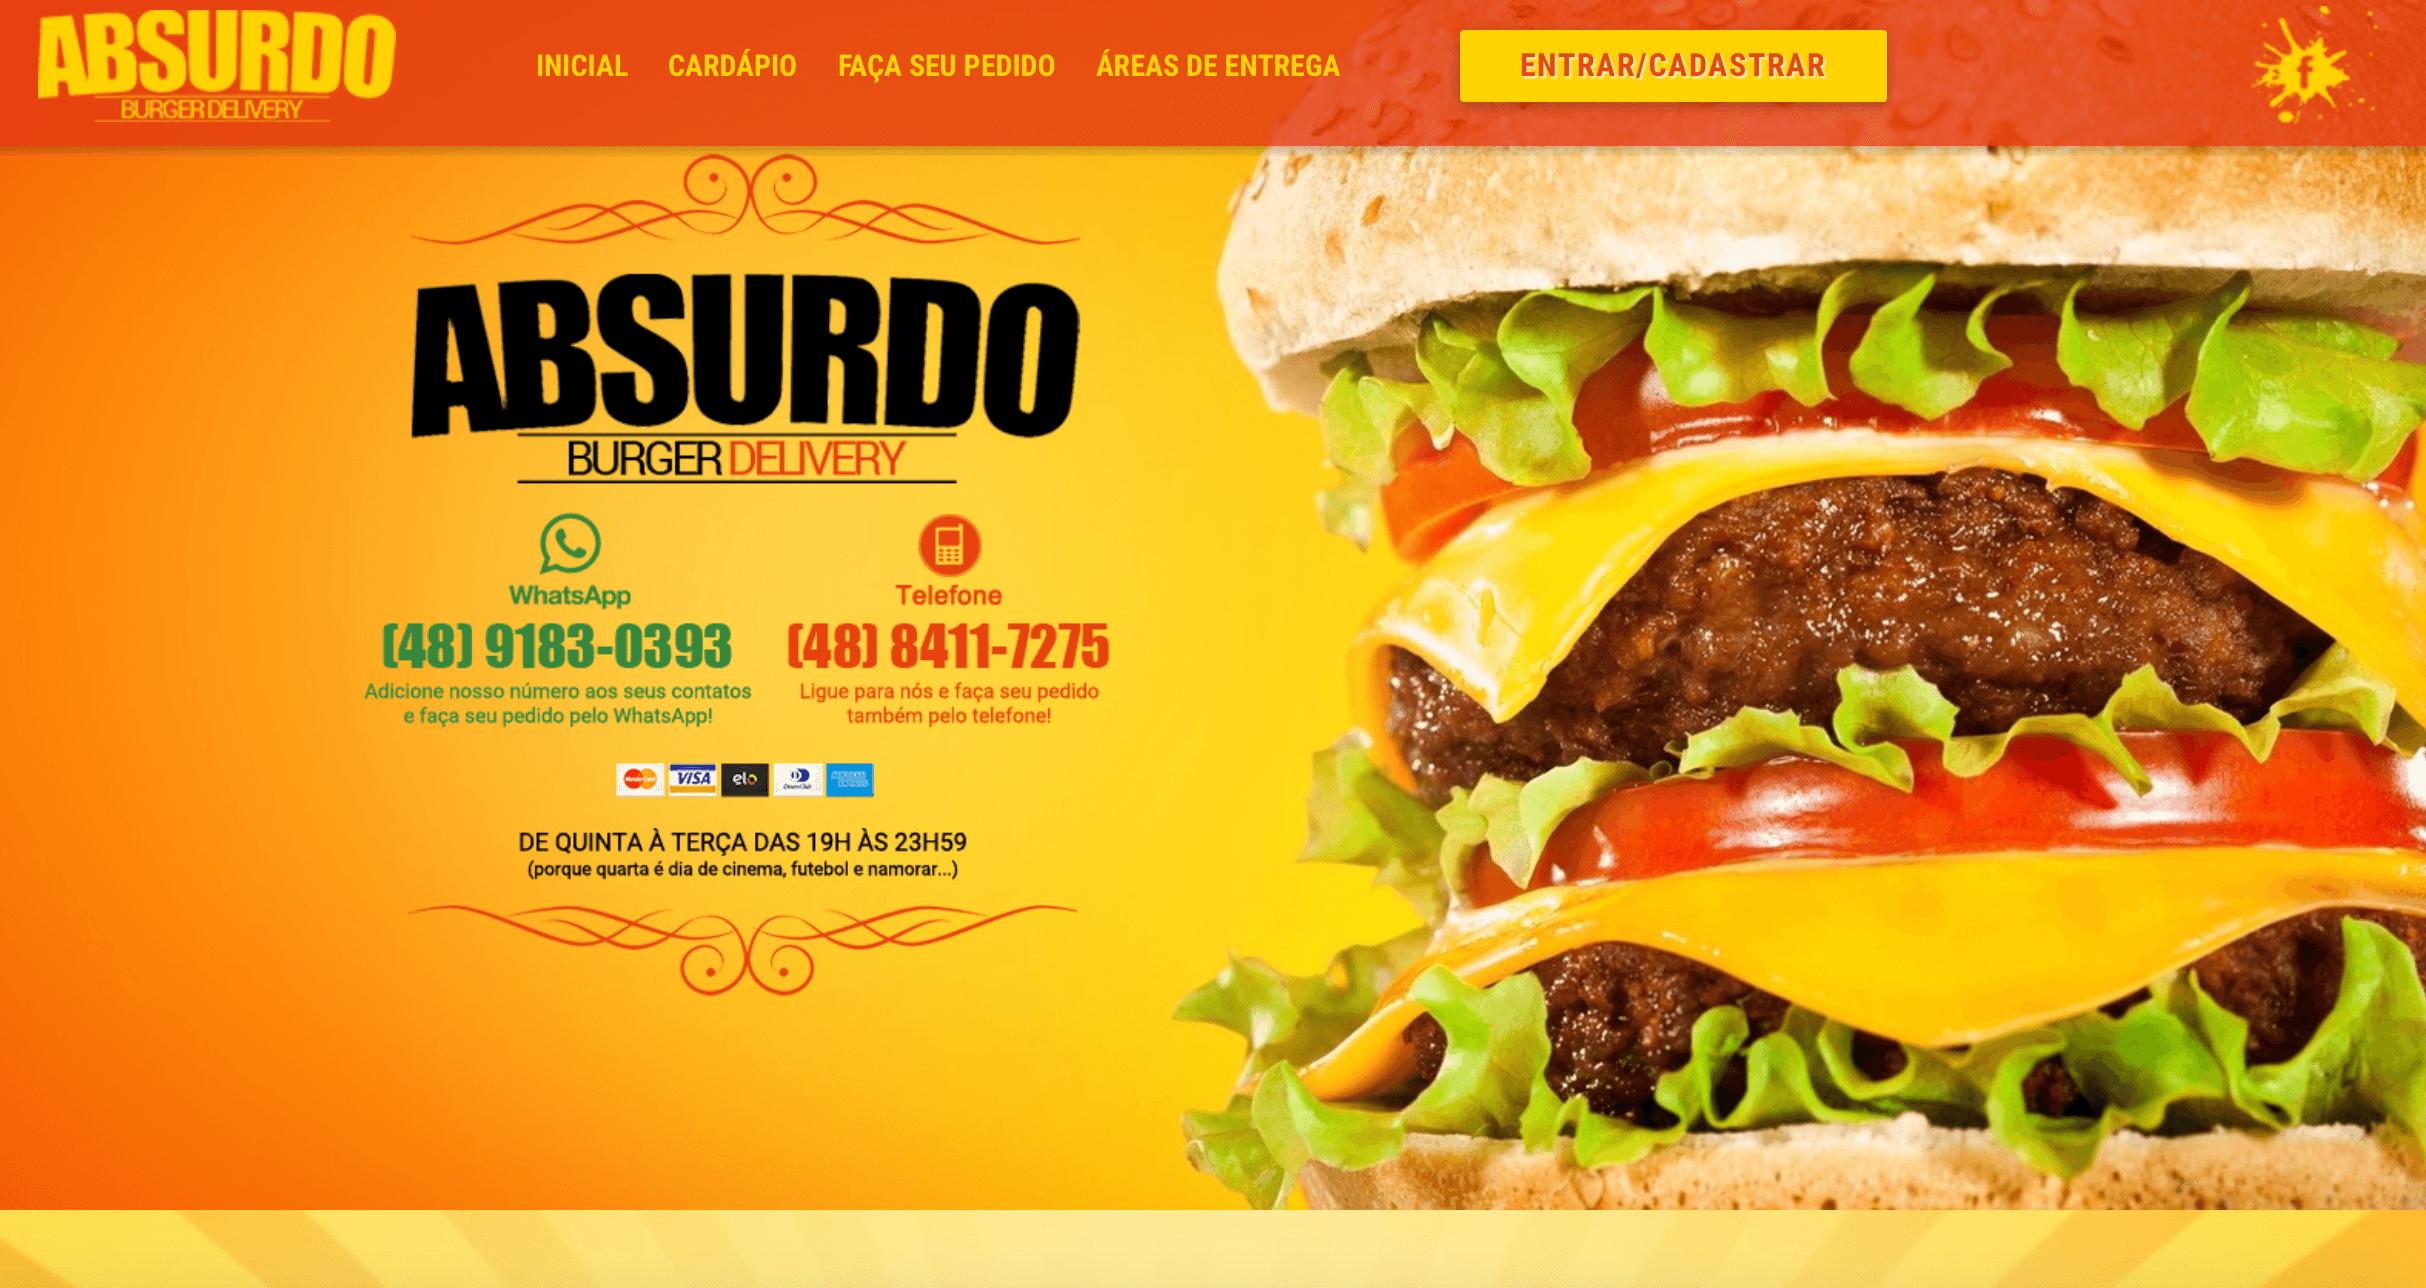 absurdo-burger-material-design